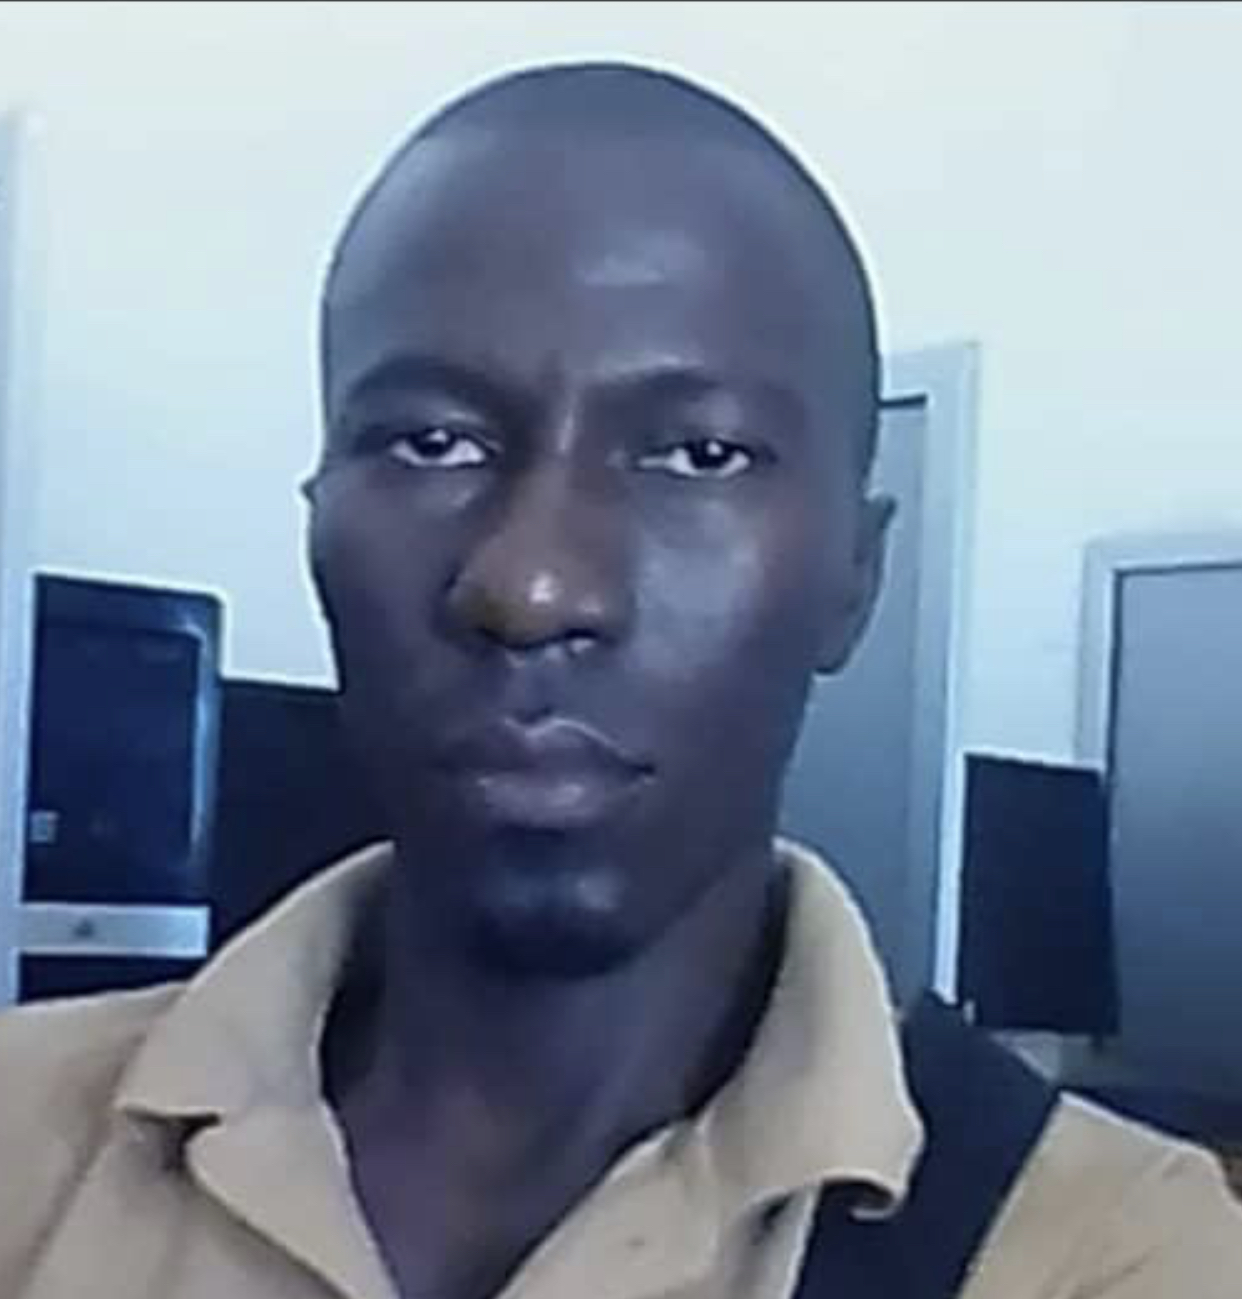 Tamba : Pape Alioune Fall le meurtrier de Bineta a coupé le jeûne hier chez Malal Camara.